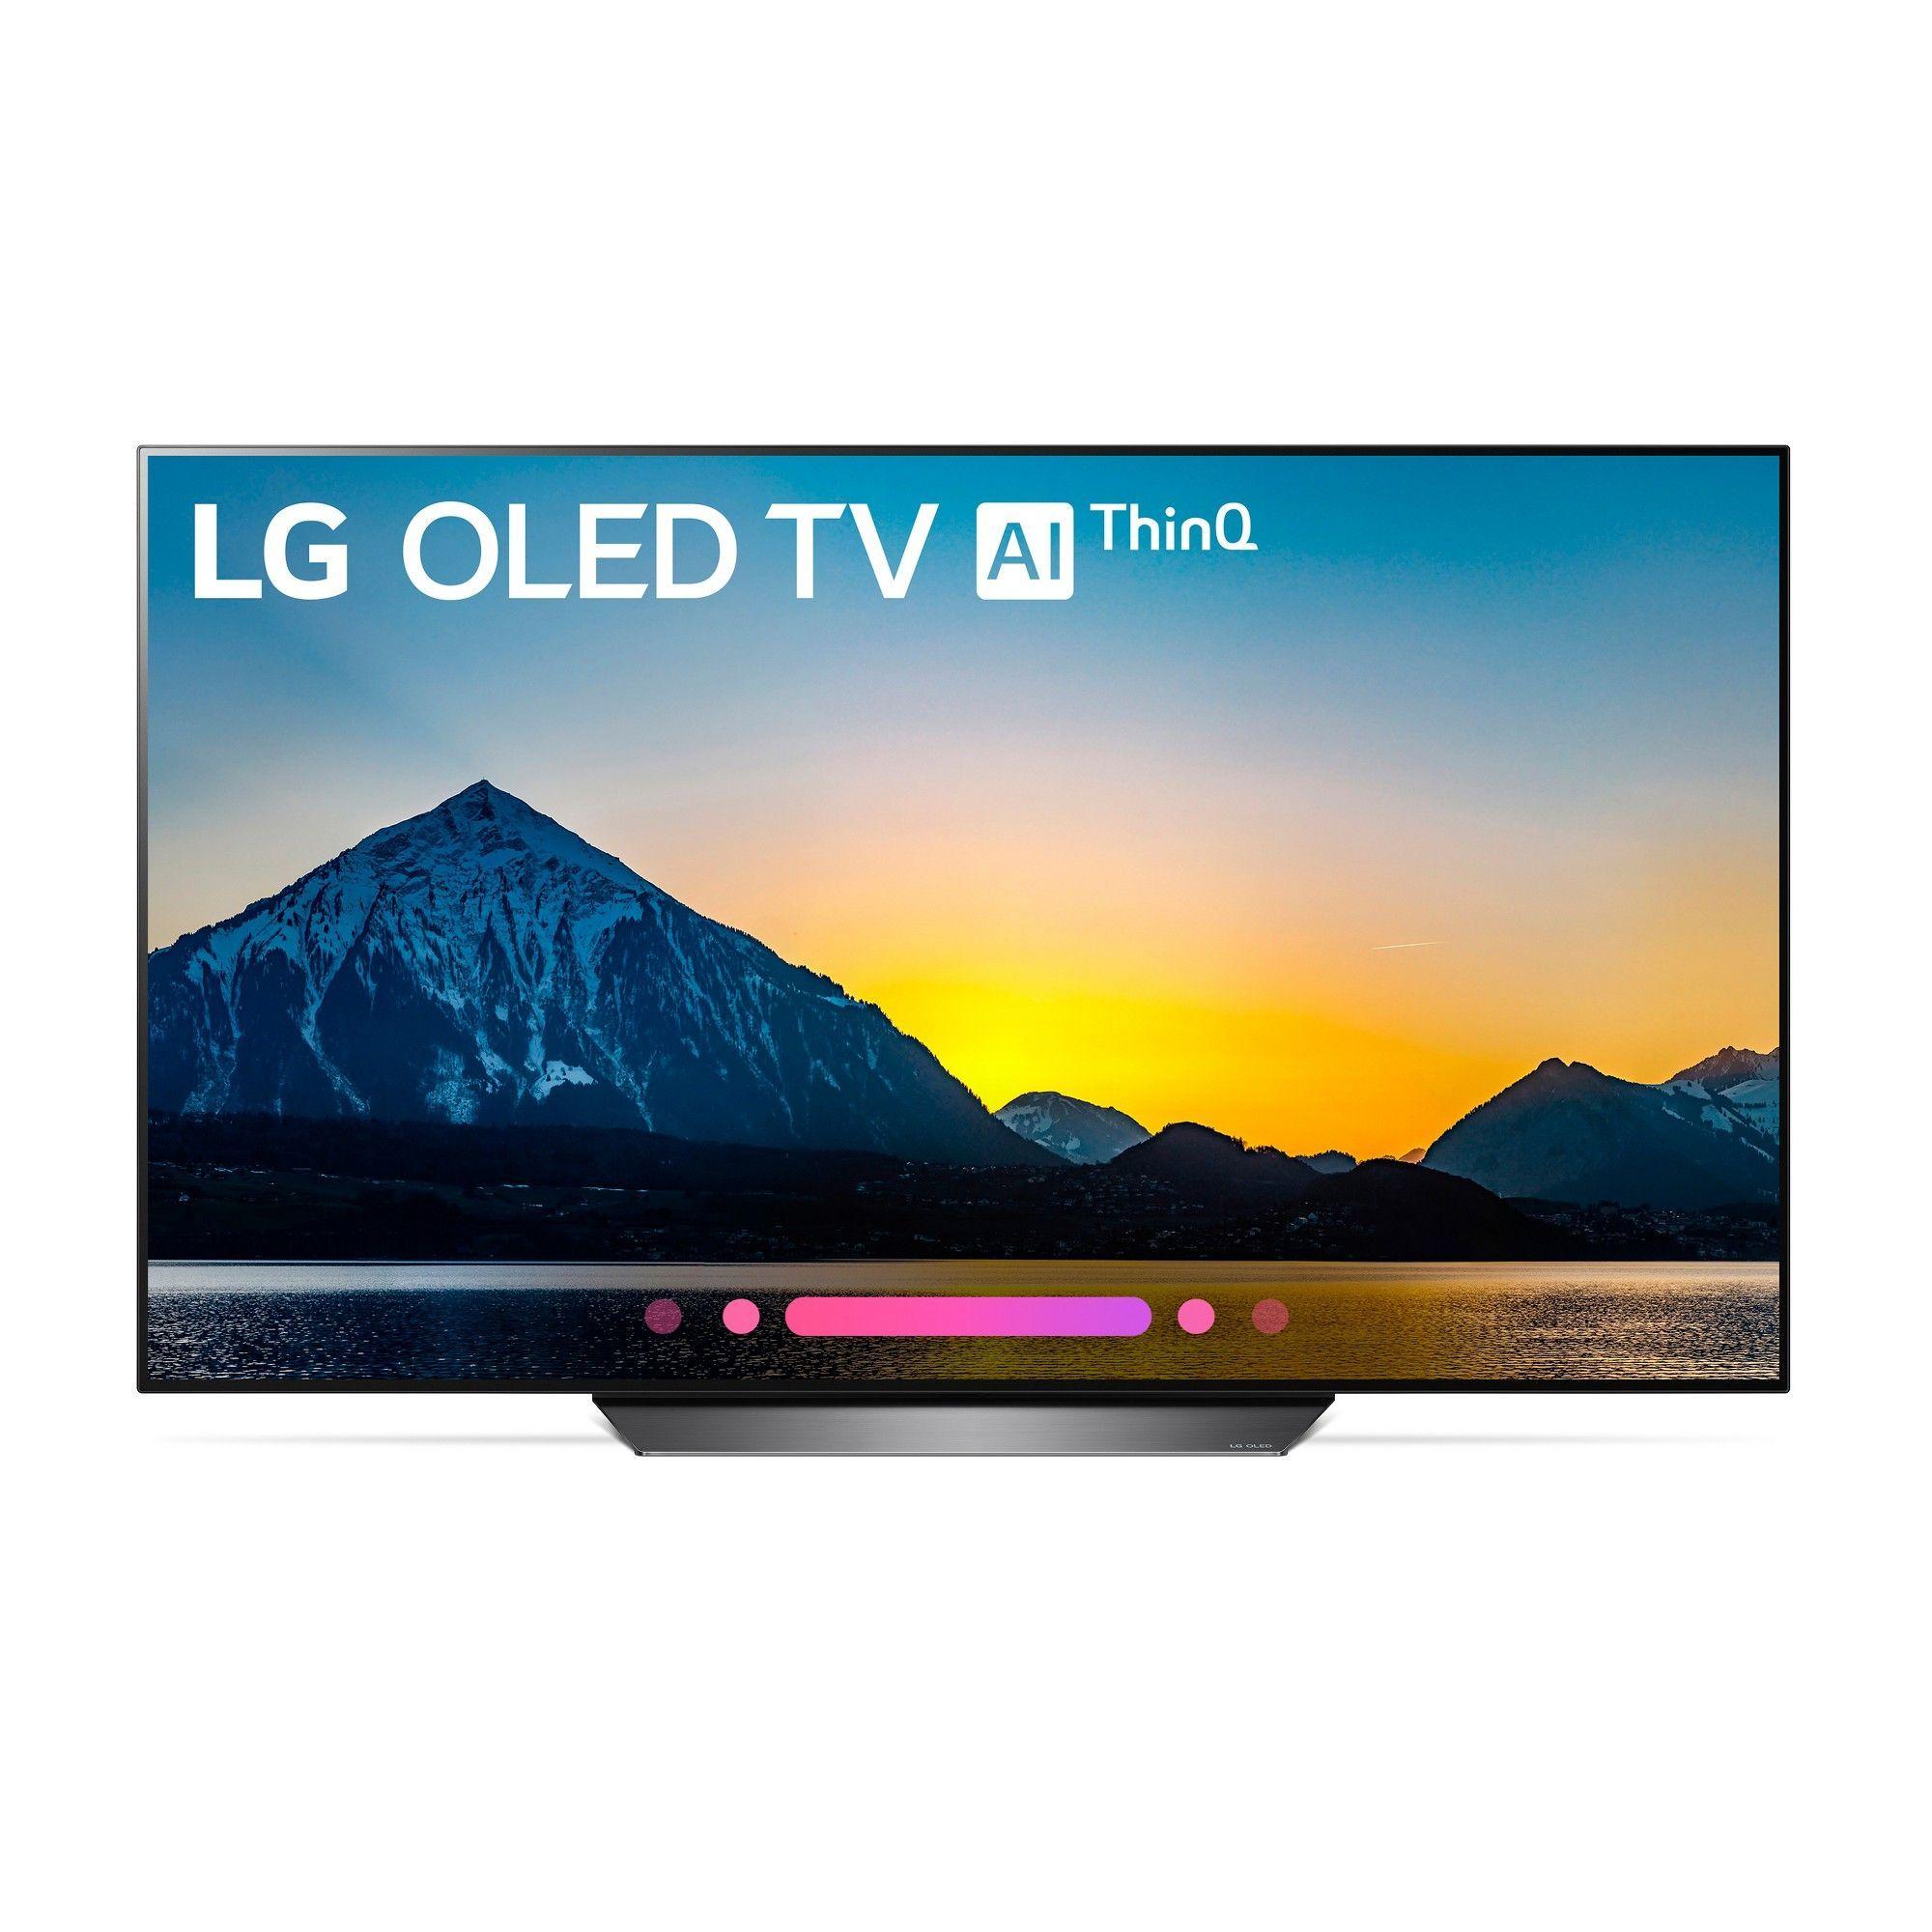 Tangible Smart Tv Remote Tvwattenscheid01 Smarttvsamsung Oled Tv Smart Tv Lg Electronics